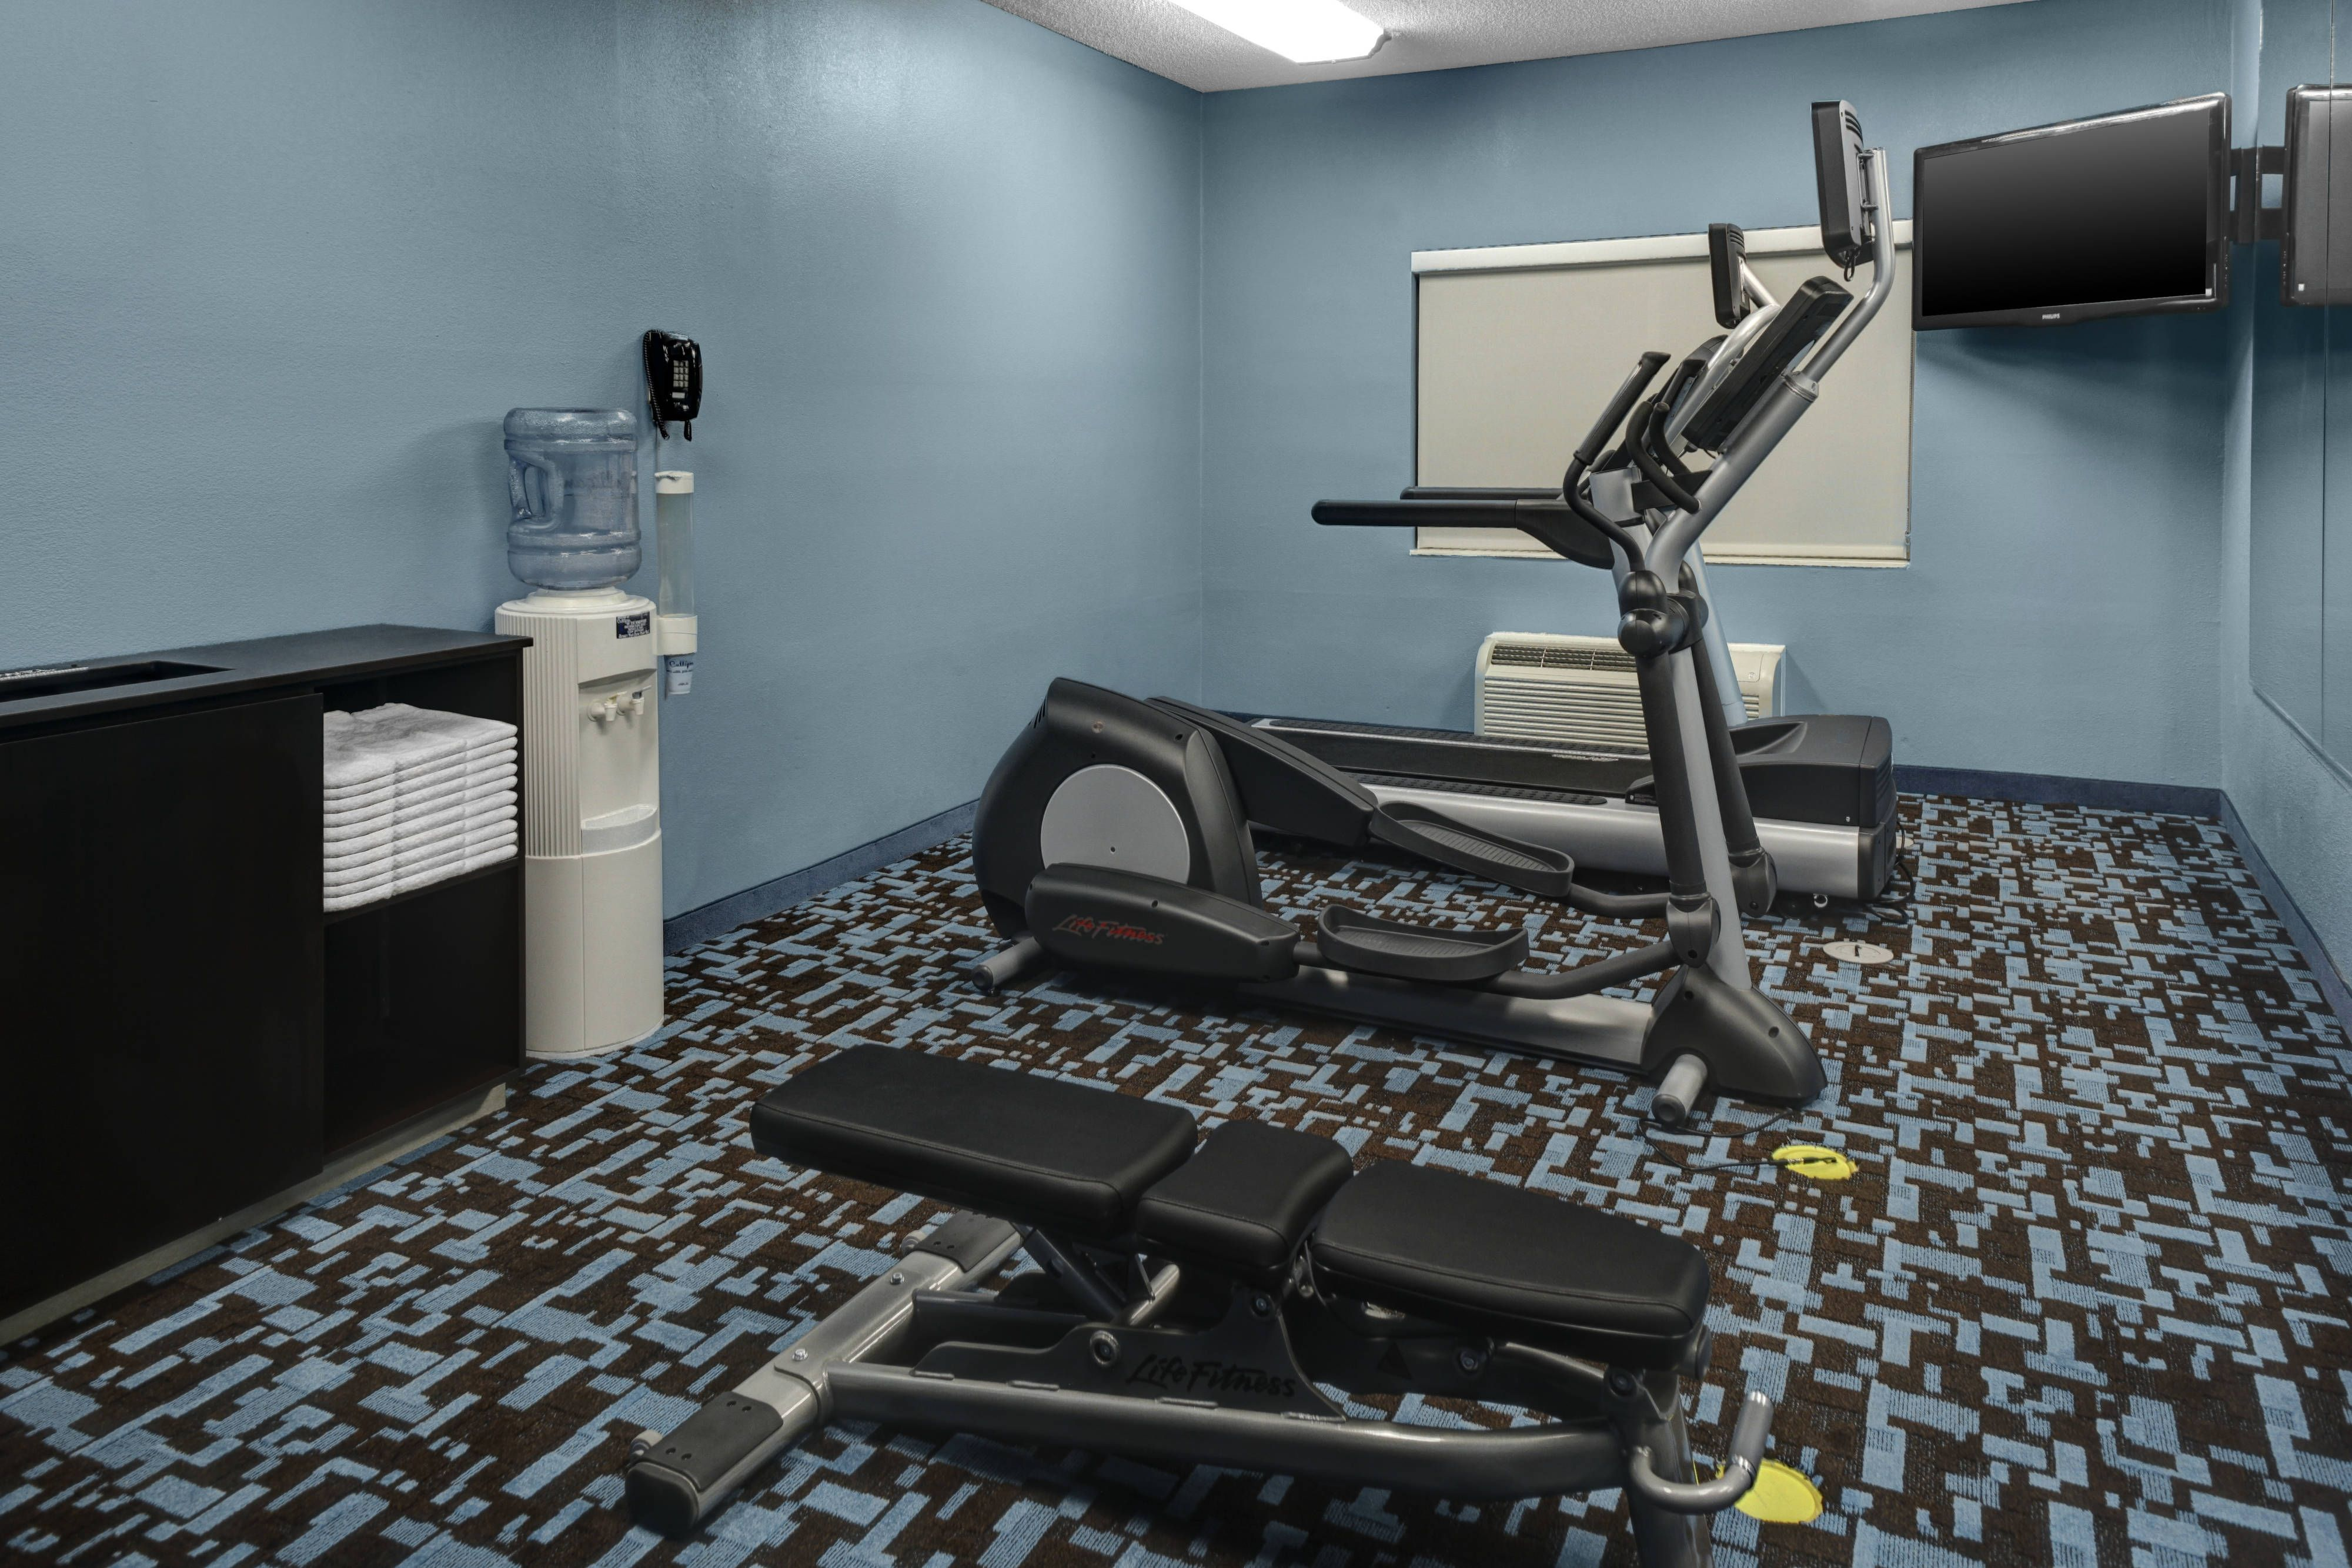 Fairfield Inn Dothan Fitness Center Visiting Happy Traveling